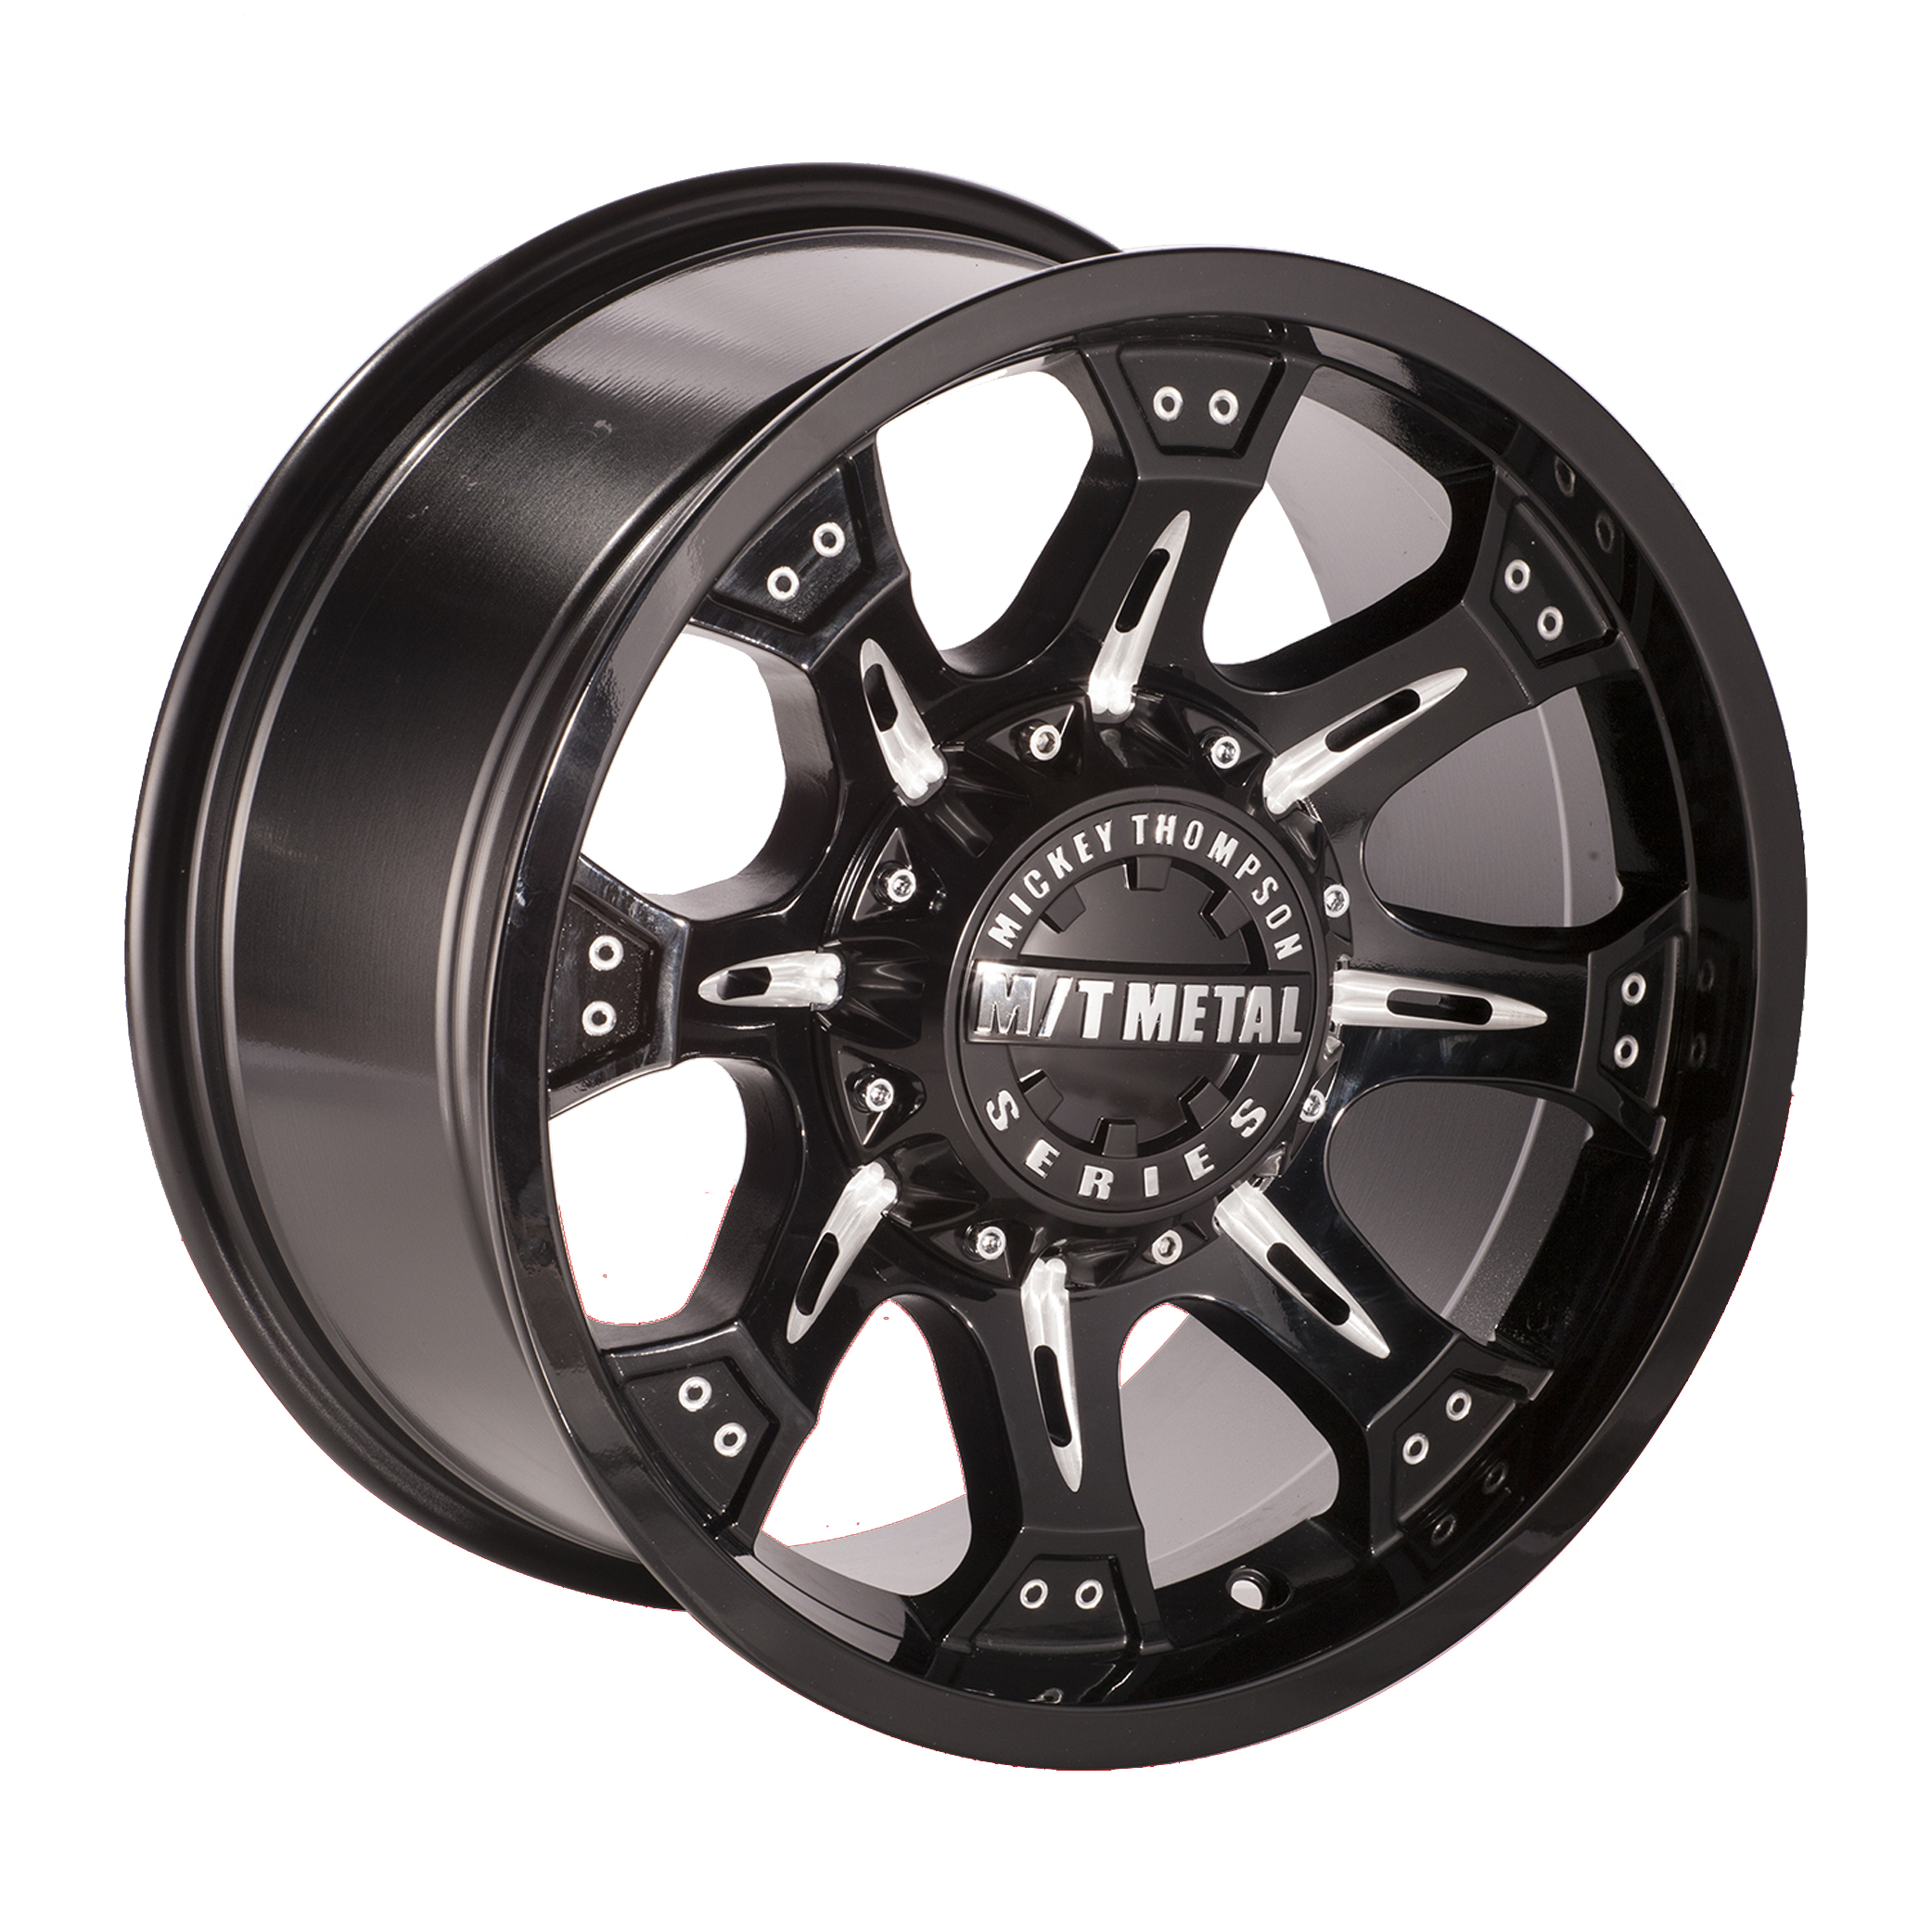 4x4 Alloy Wheels Warwick